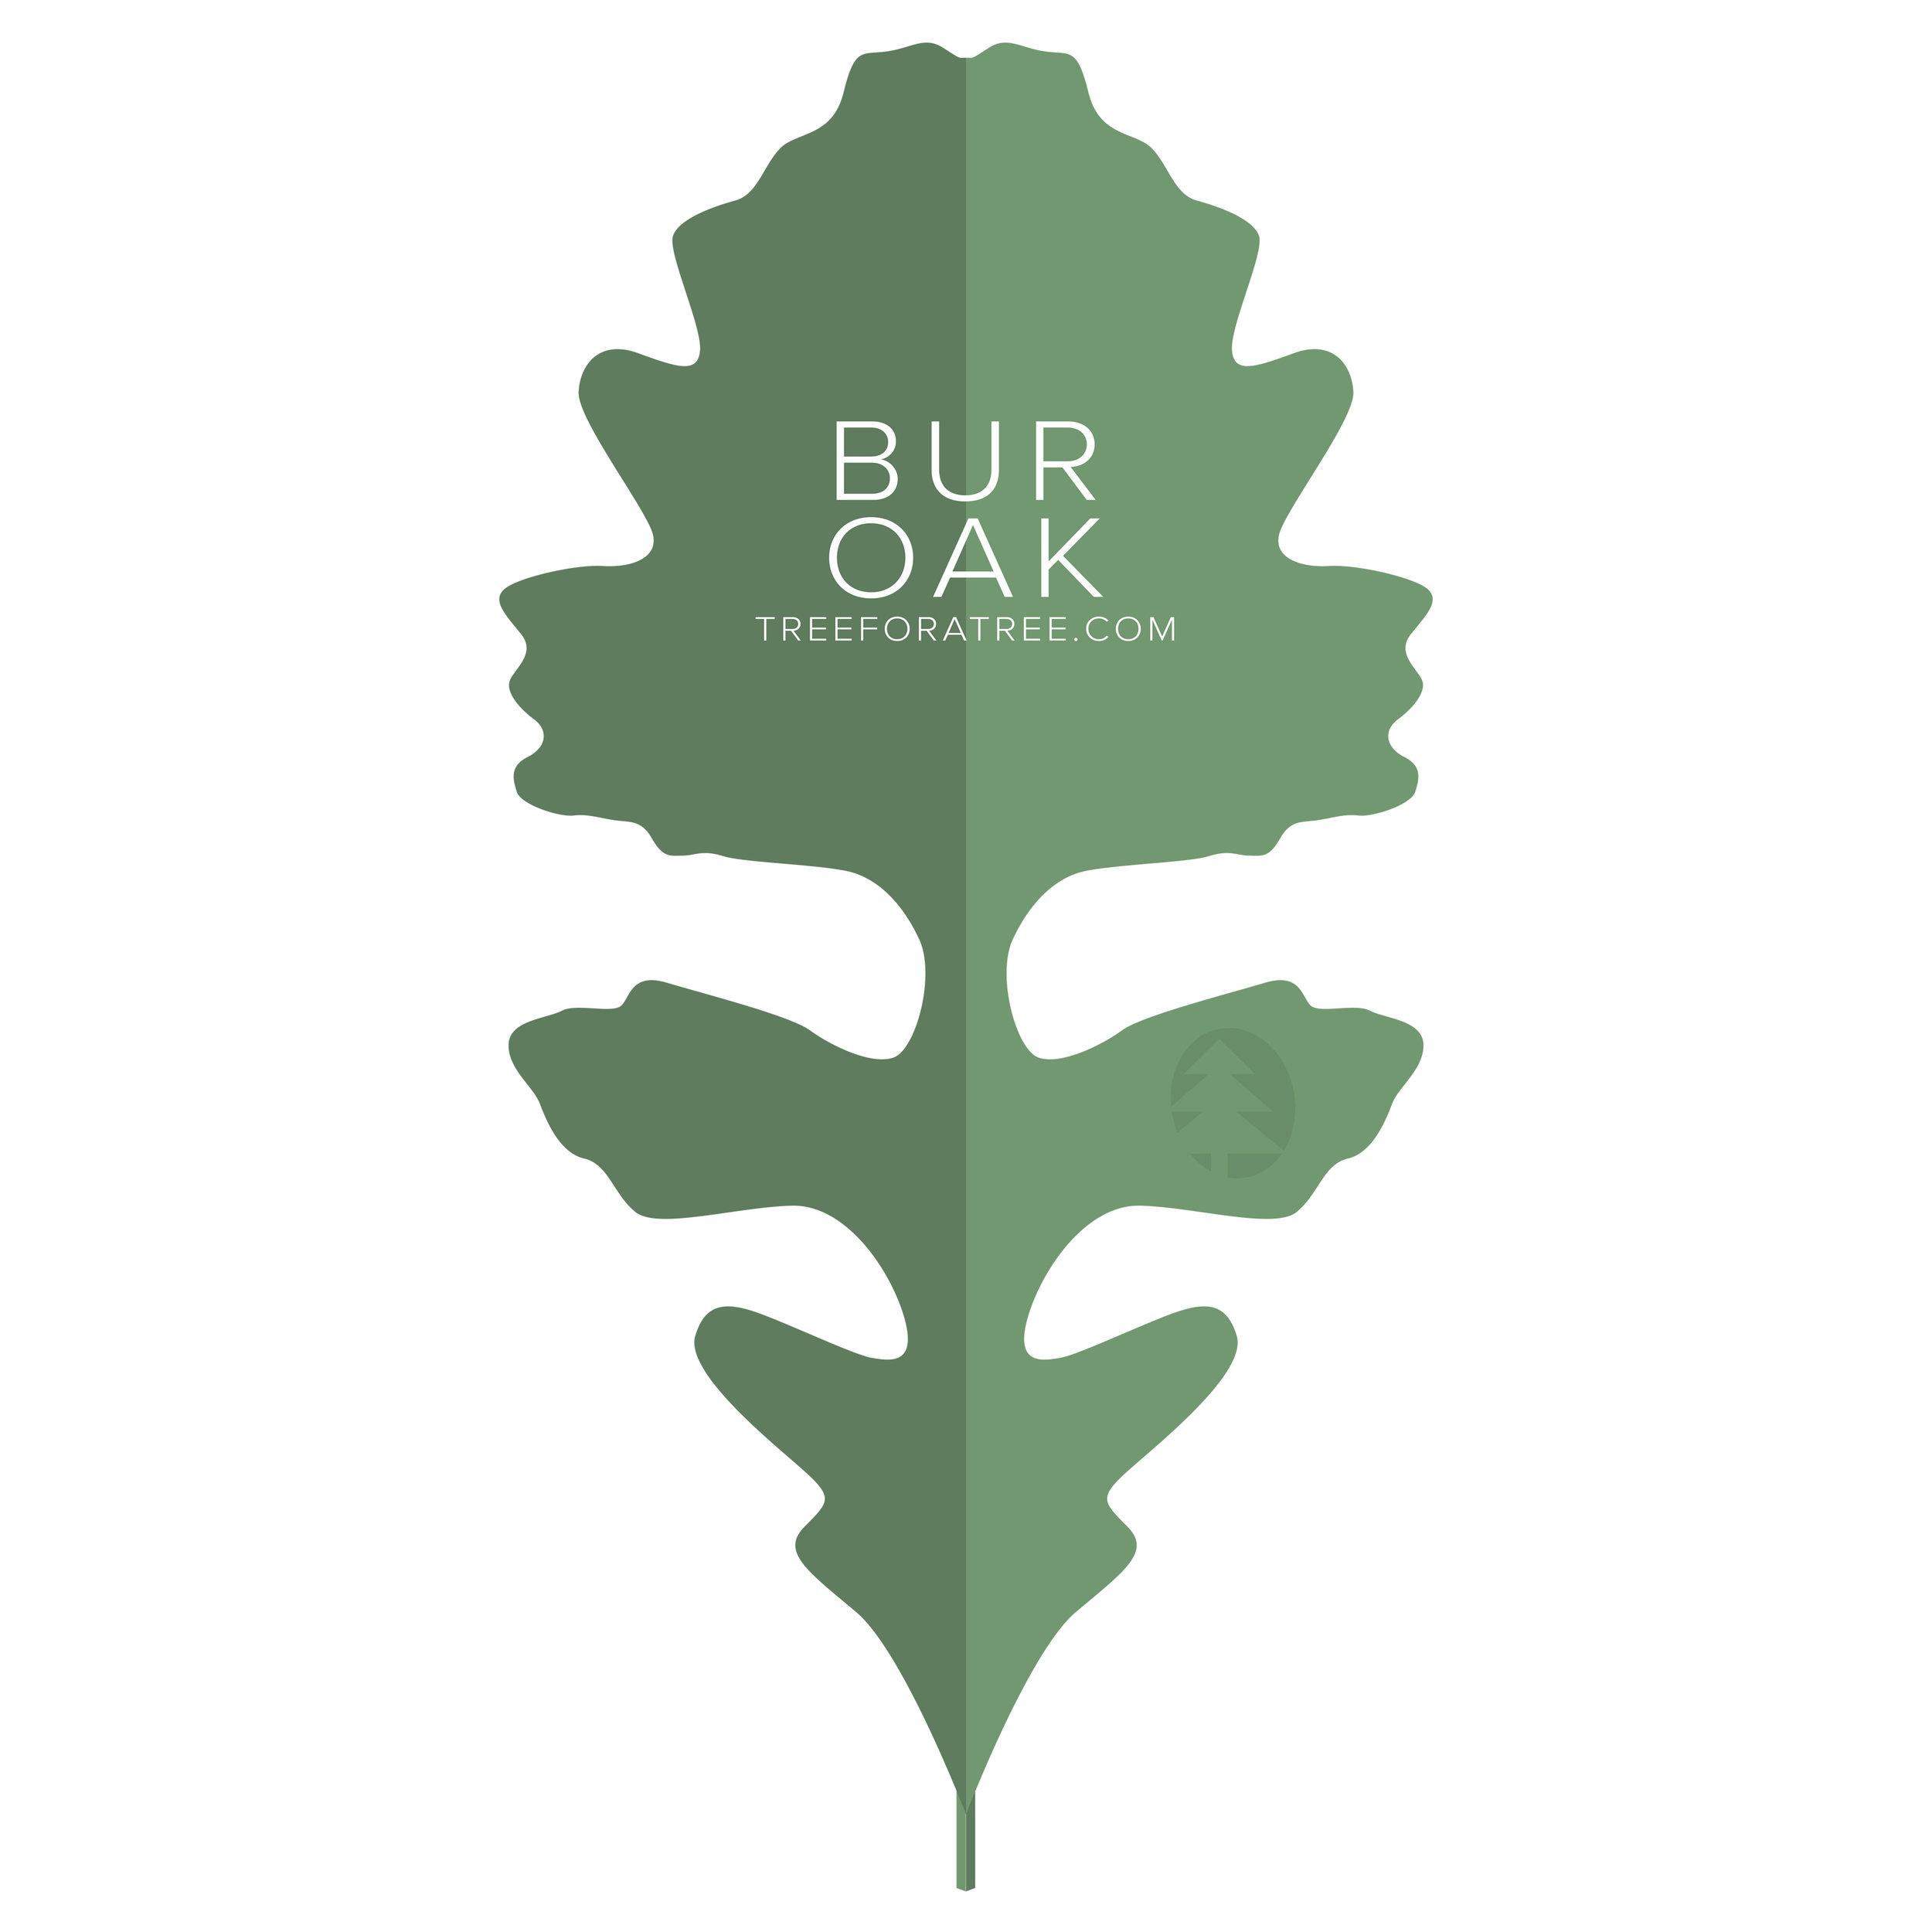 Bur Oak - Latin Name: Quercus macrocarpaGrowth Rate: SlowMature Height: ≈85 ftMature Spread: ≈75 ftState Champ: Pickaway Co. (90' high x 124' spread)